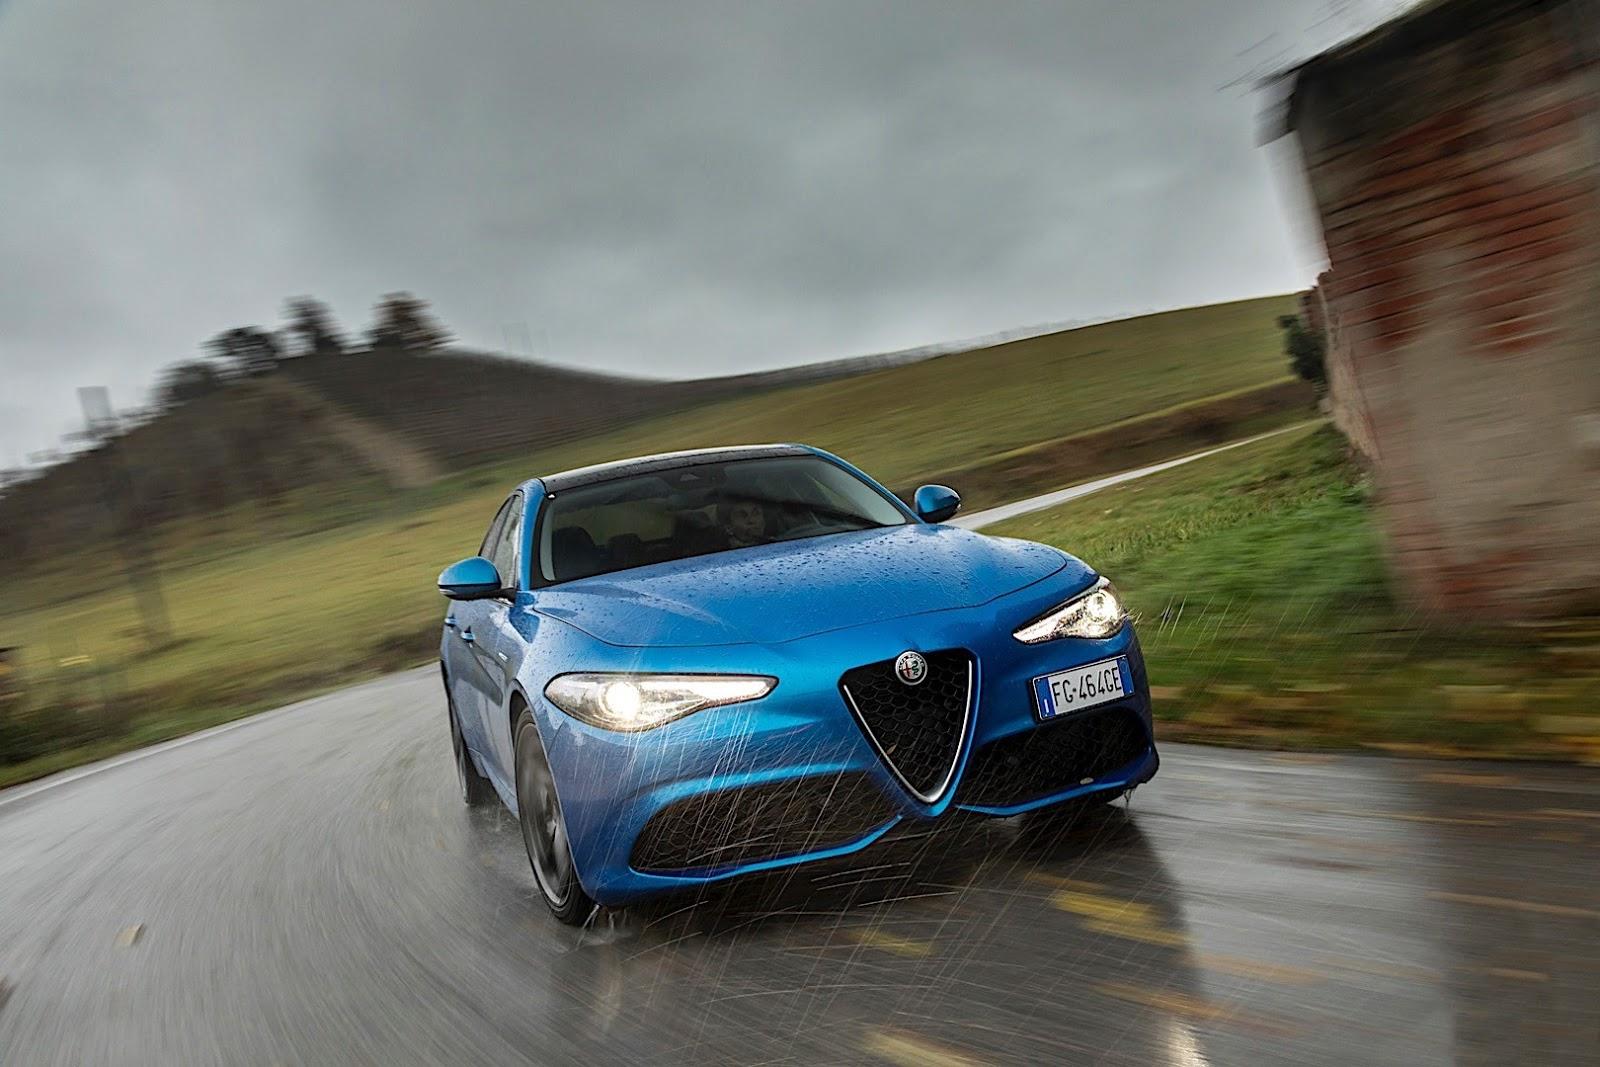 alfarain Είναι η Alfa Romeo Giulia τόσο καλή όσο λένε; Alfa, alfa romeo, Alfa Romeo Giulia, TEST, ΔΟΚΙΜΕΣ, οδηγούμε